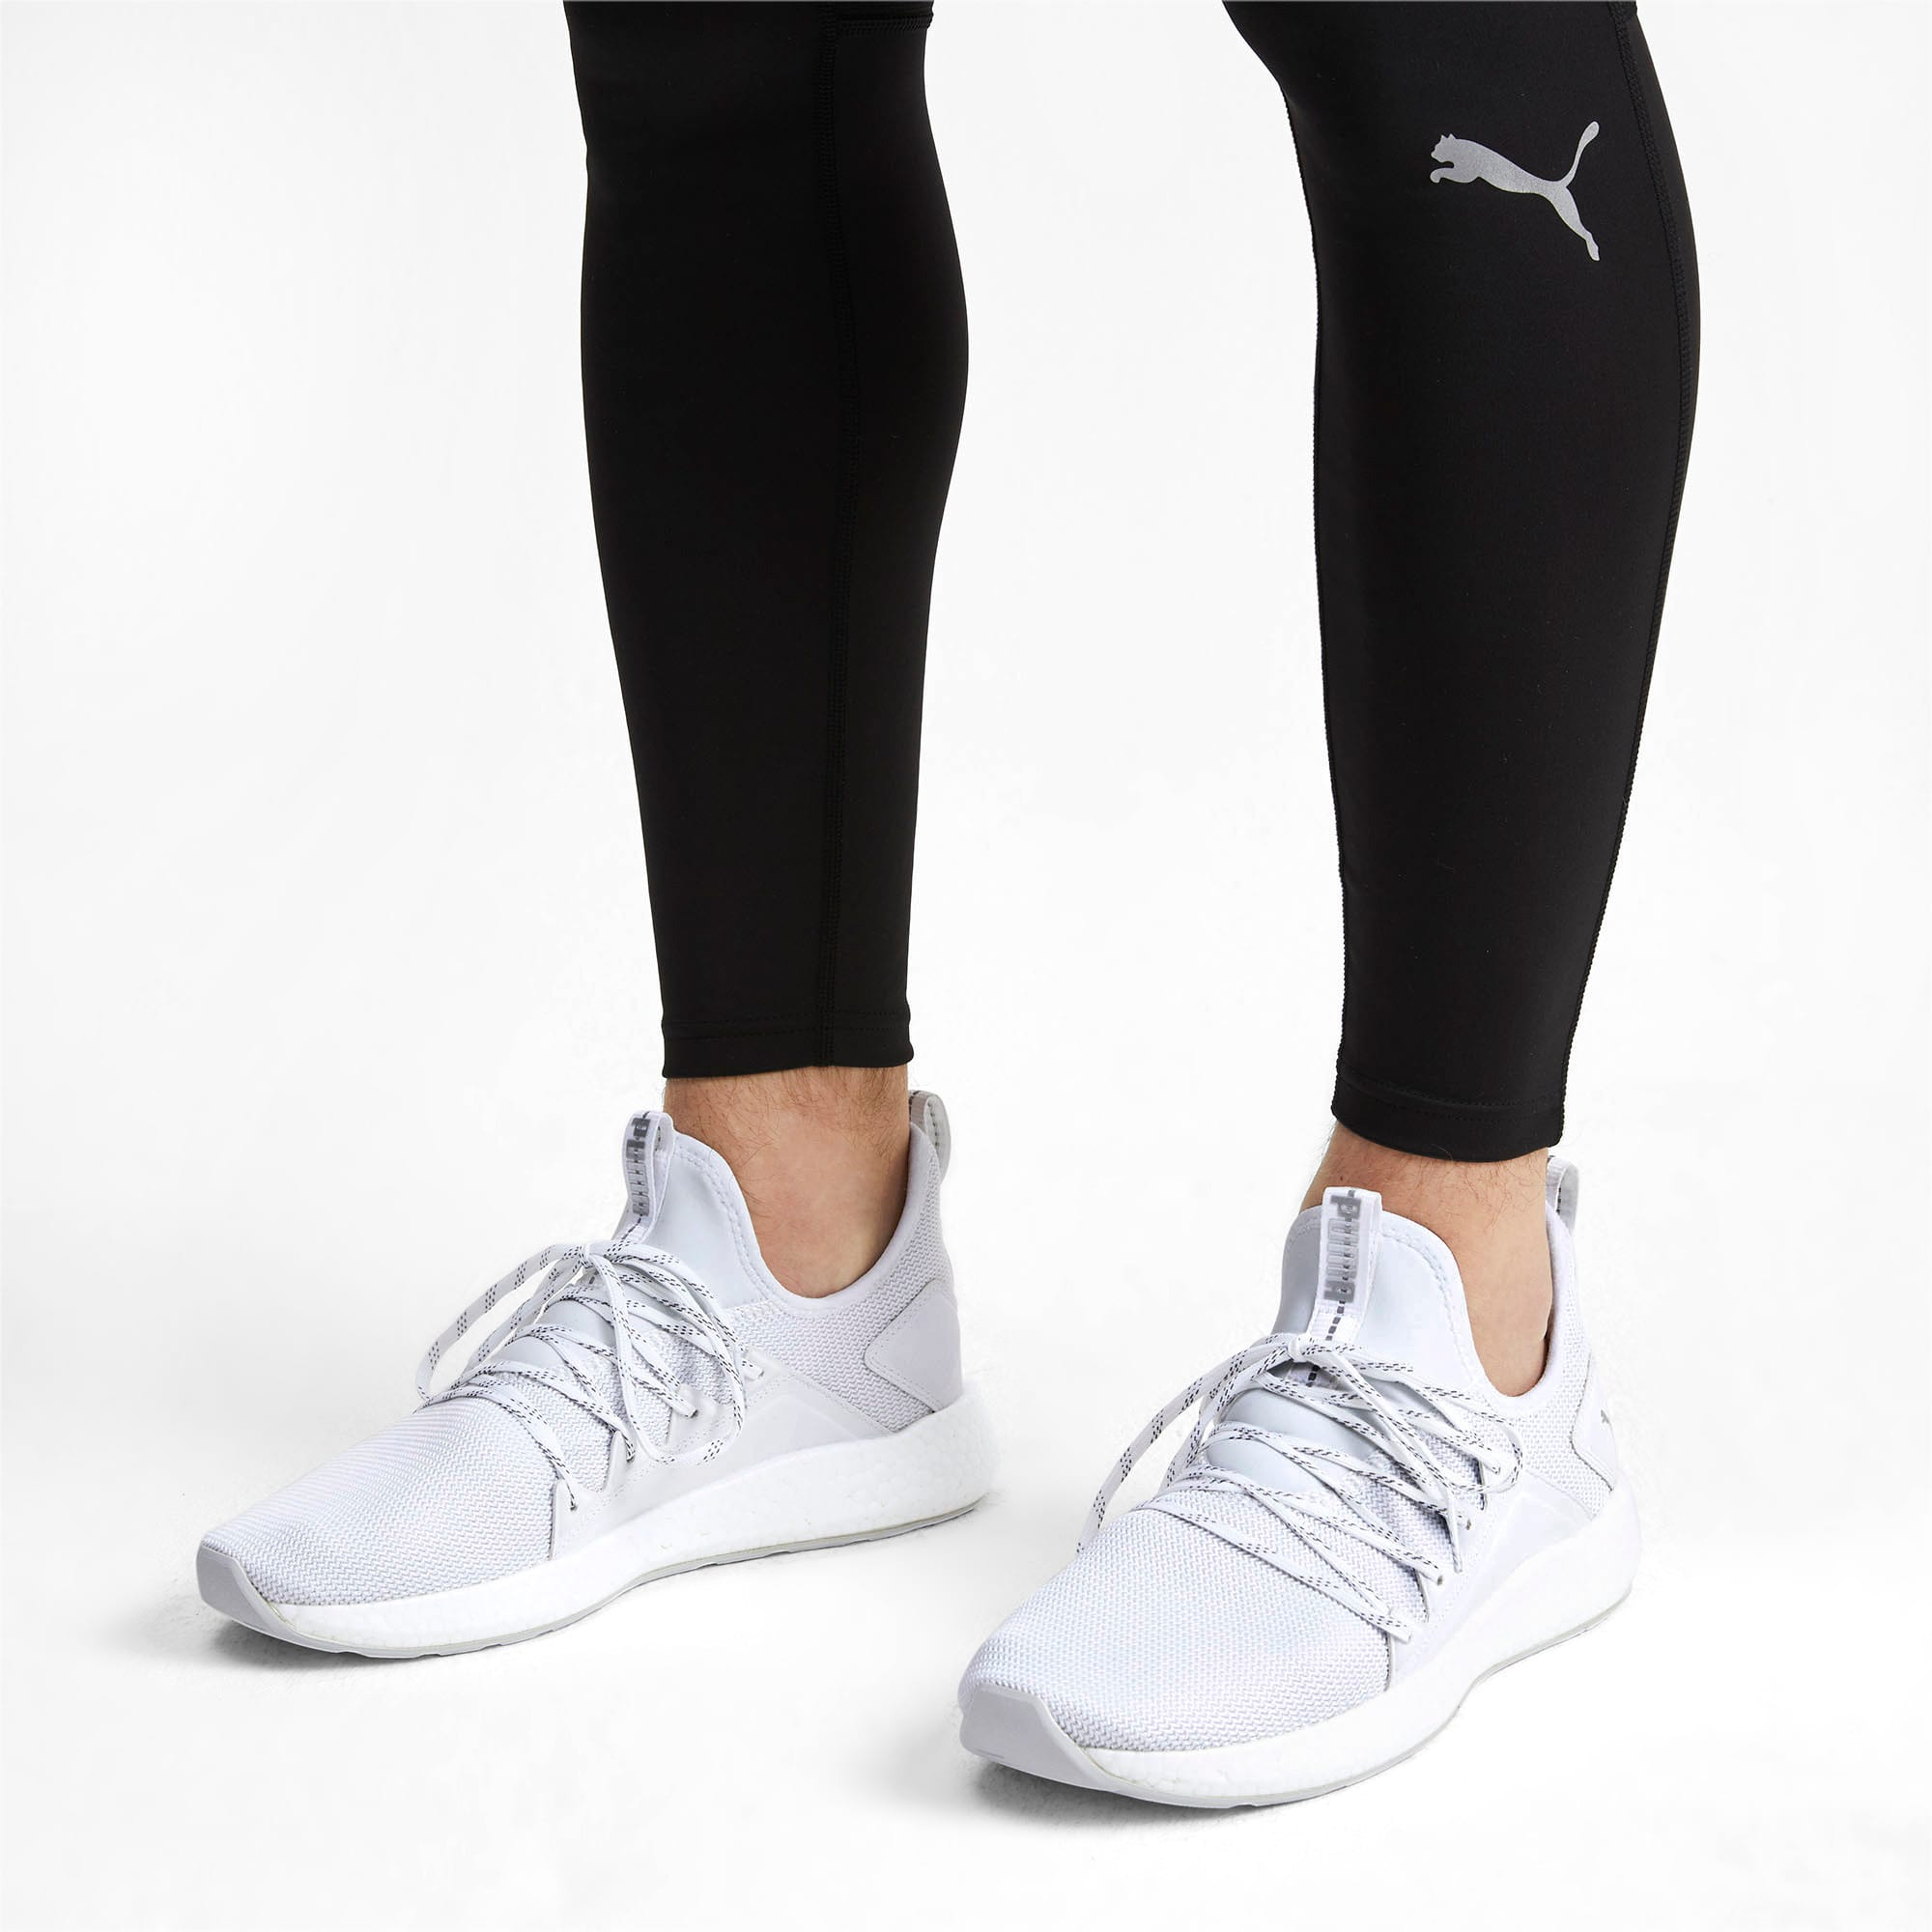 Thumbnail 2 of NRGY Neko Lights Men's Running Shoes, Puma White, medium